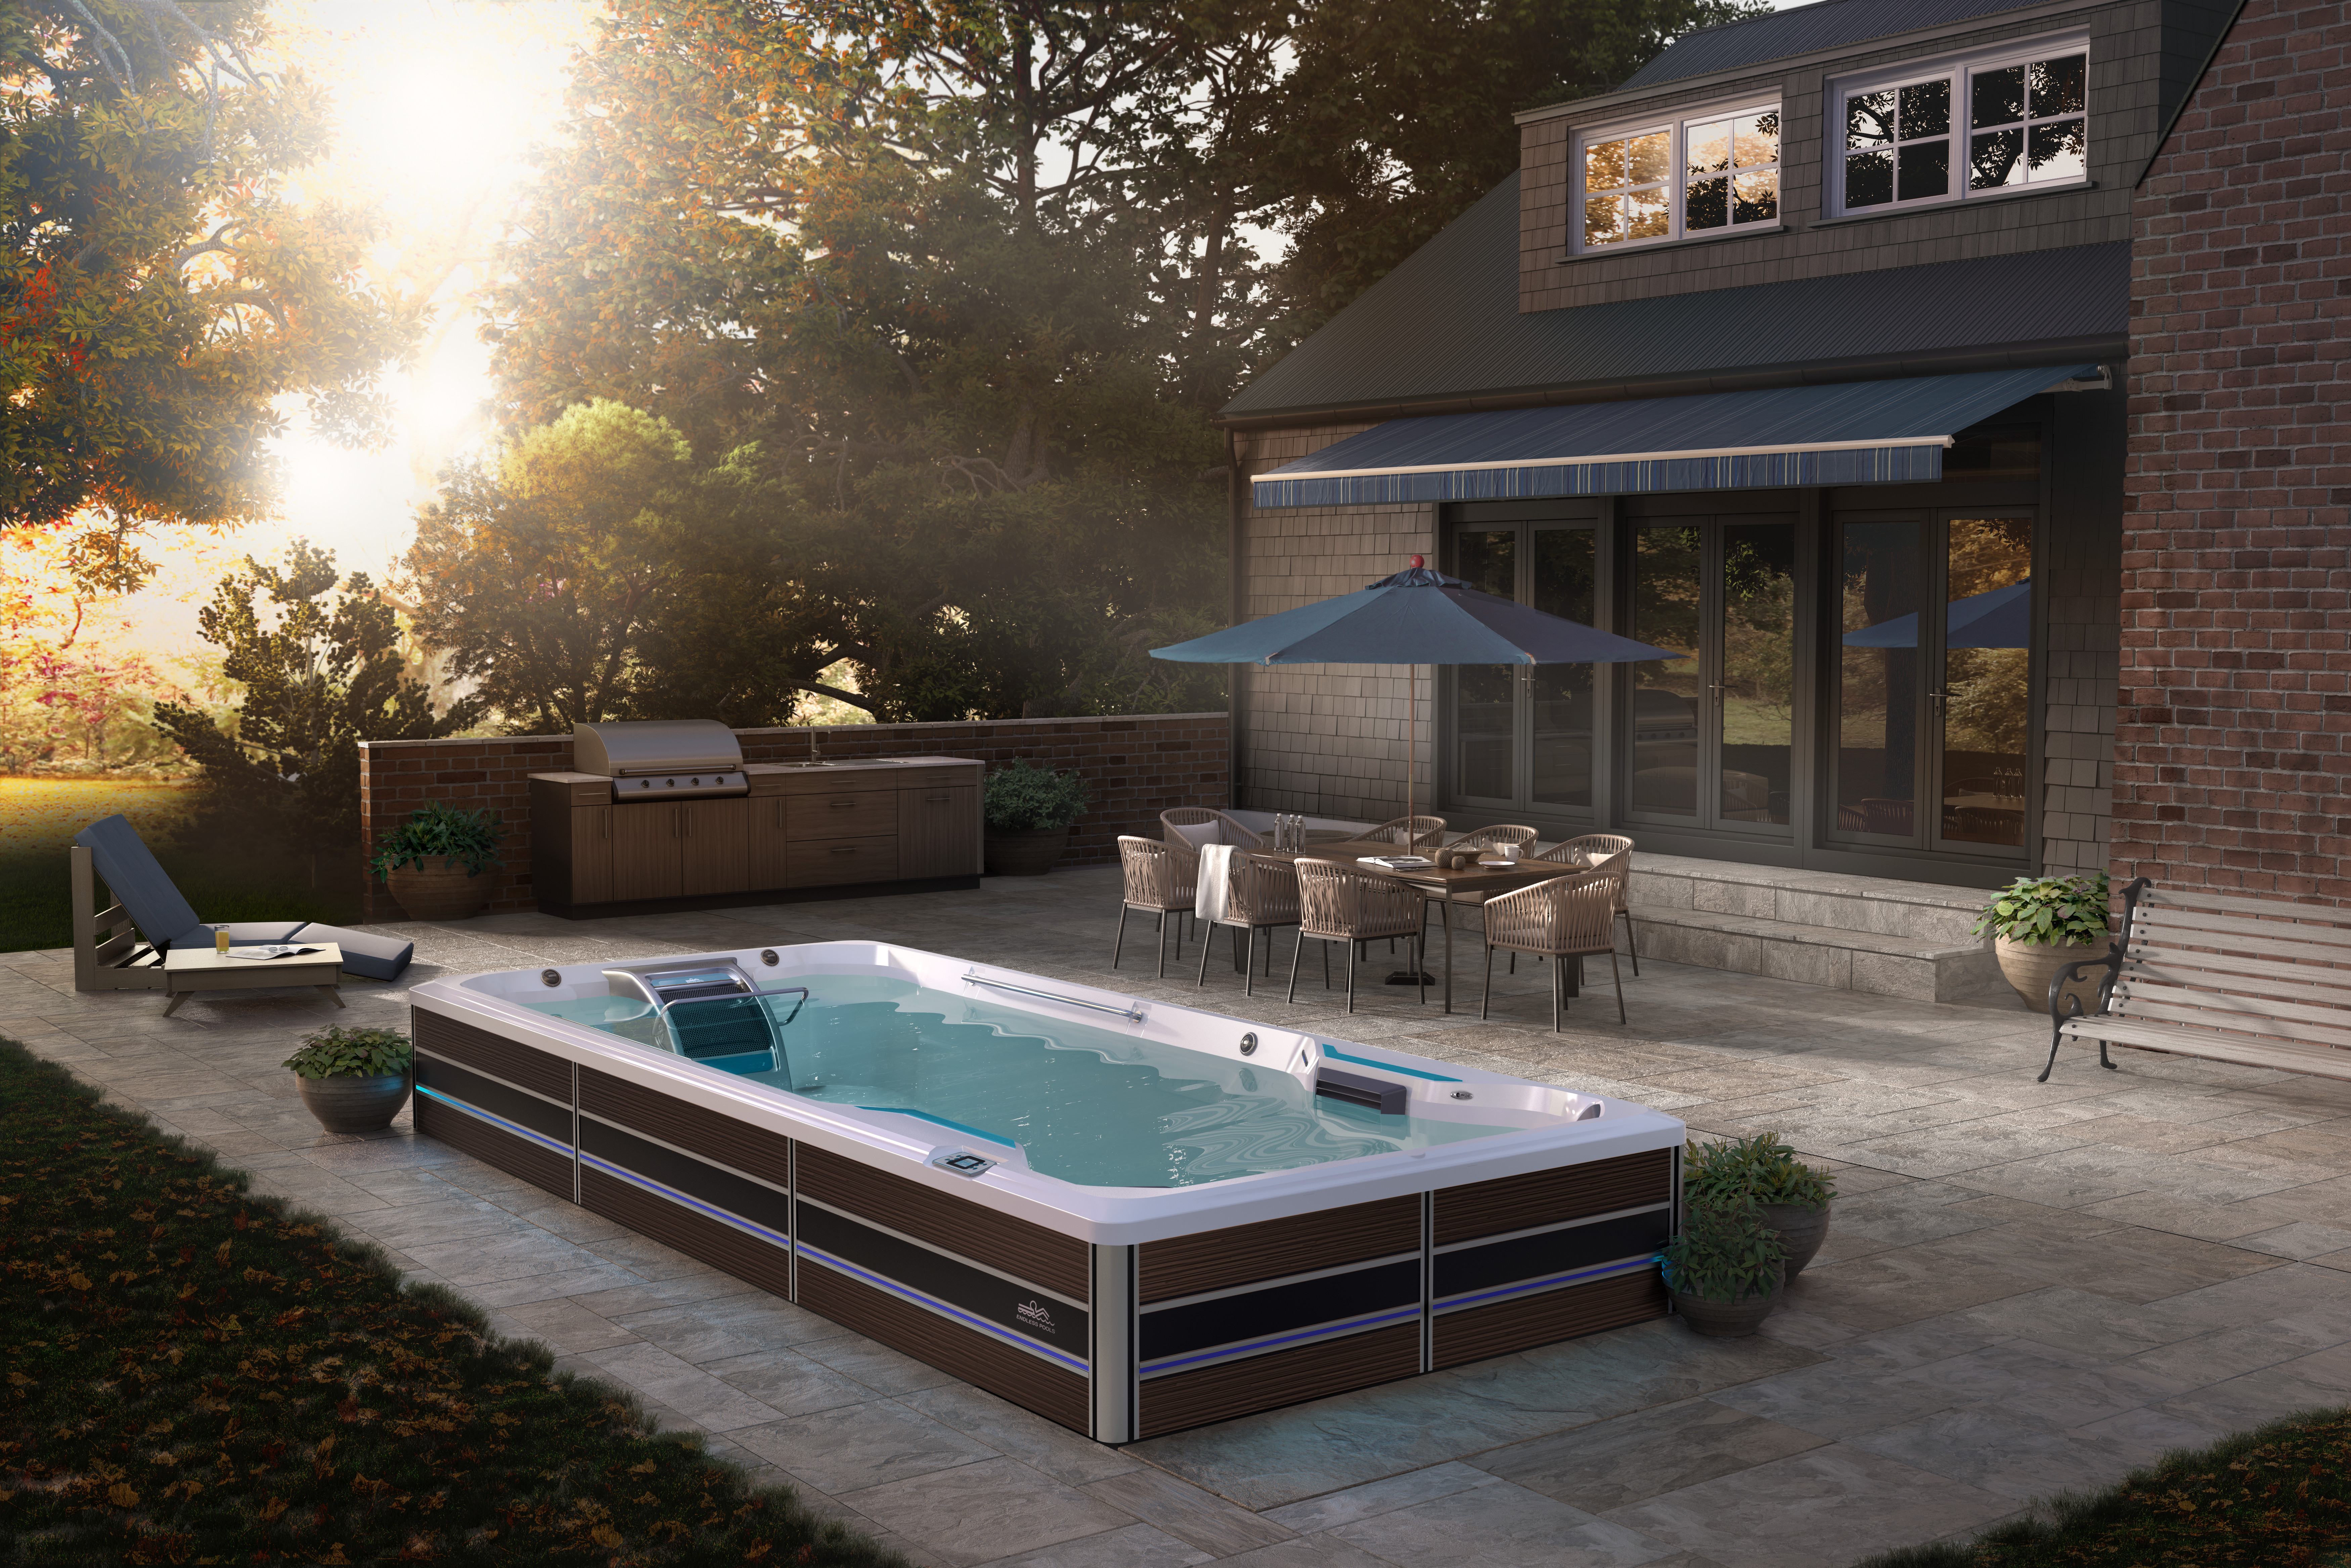 Endless Pool backyard install